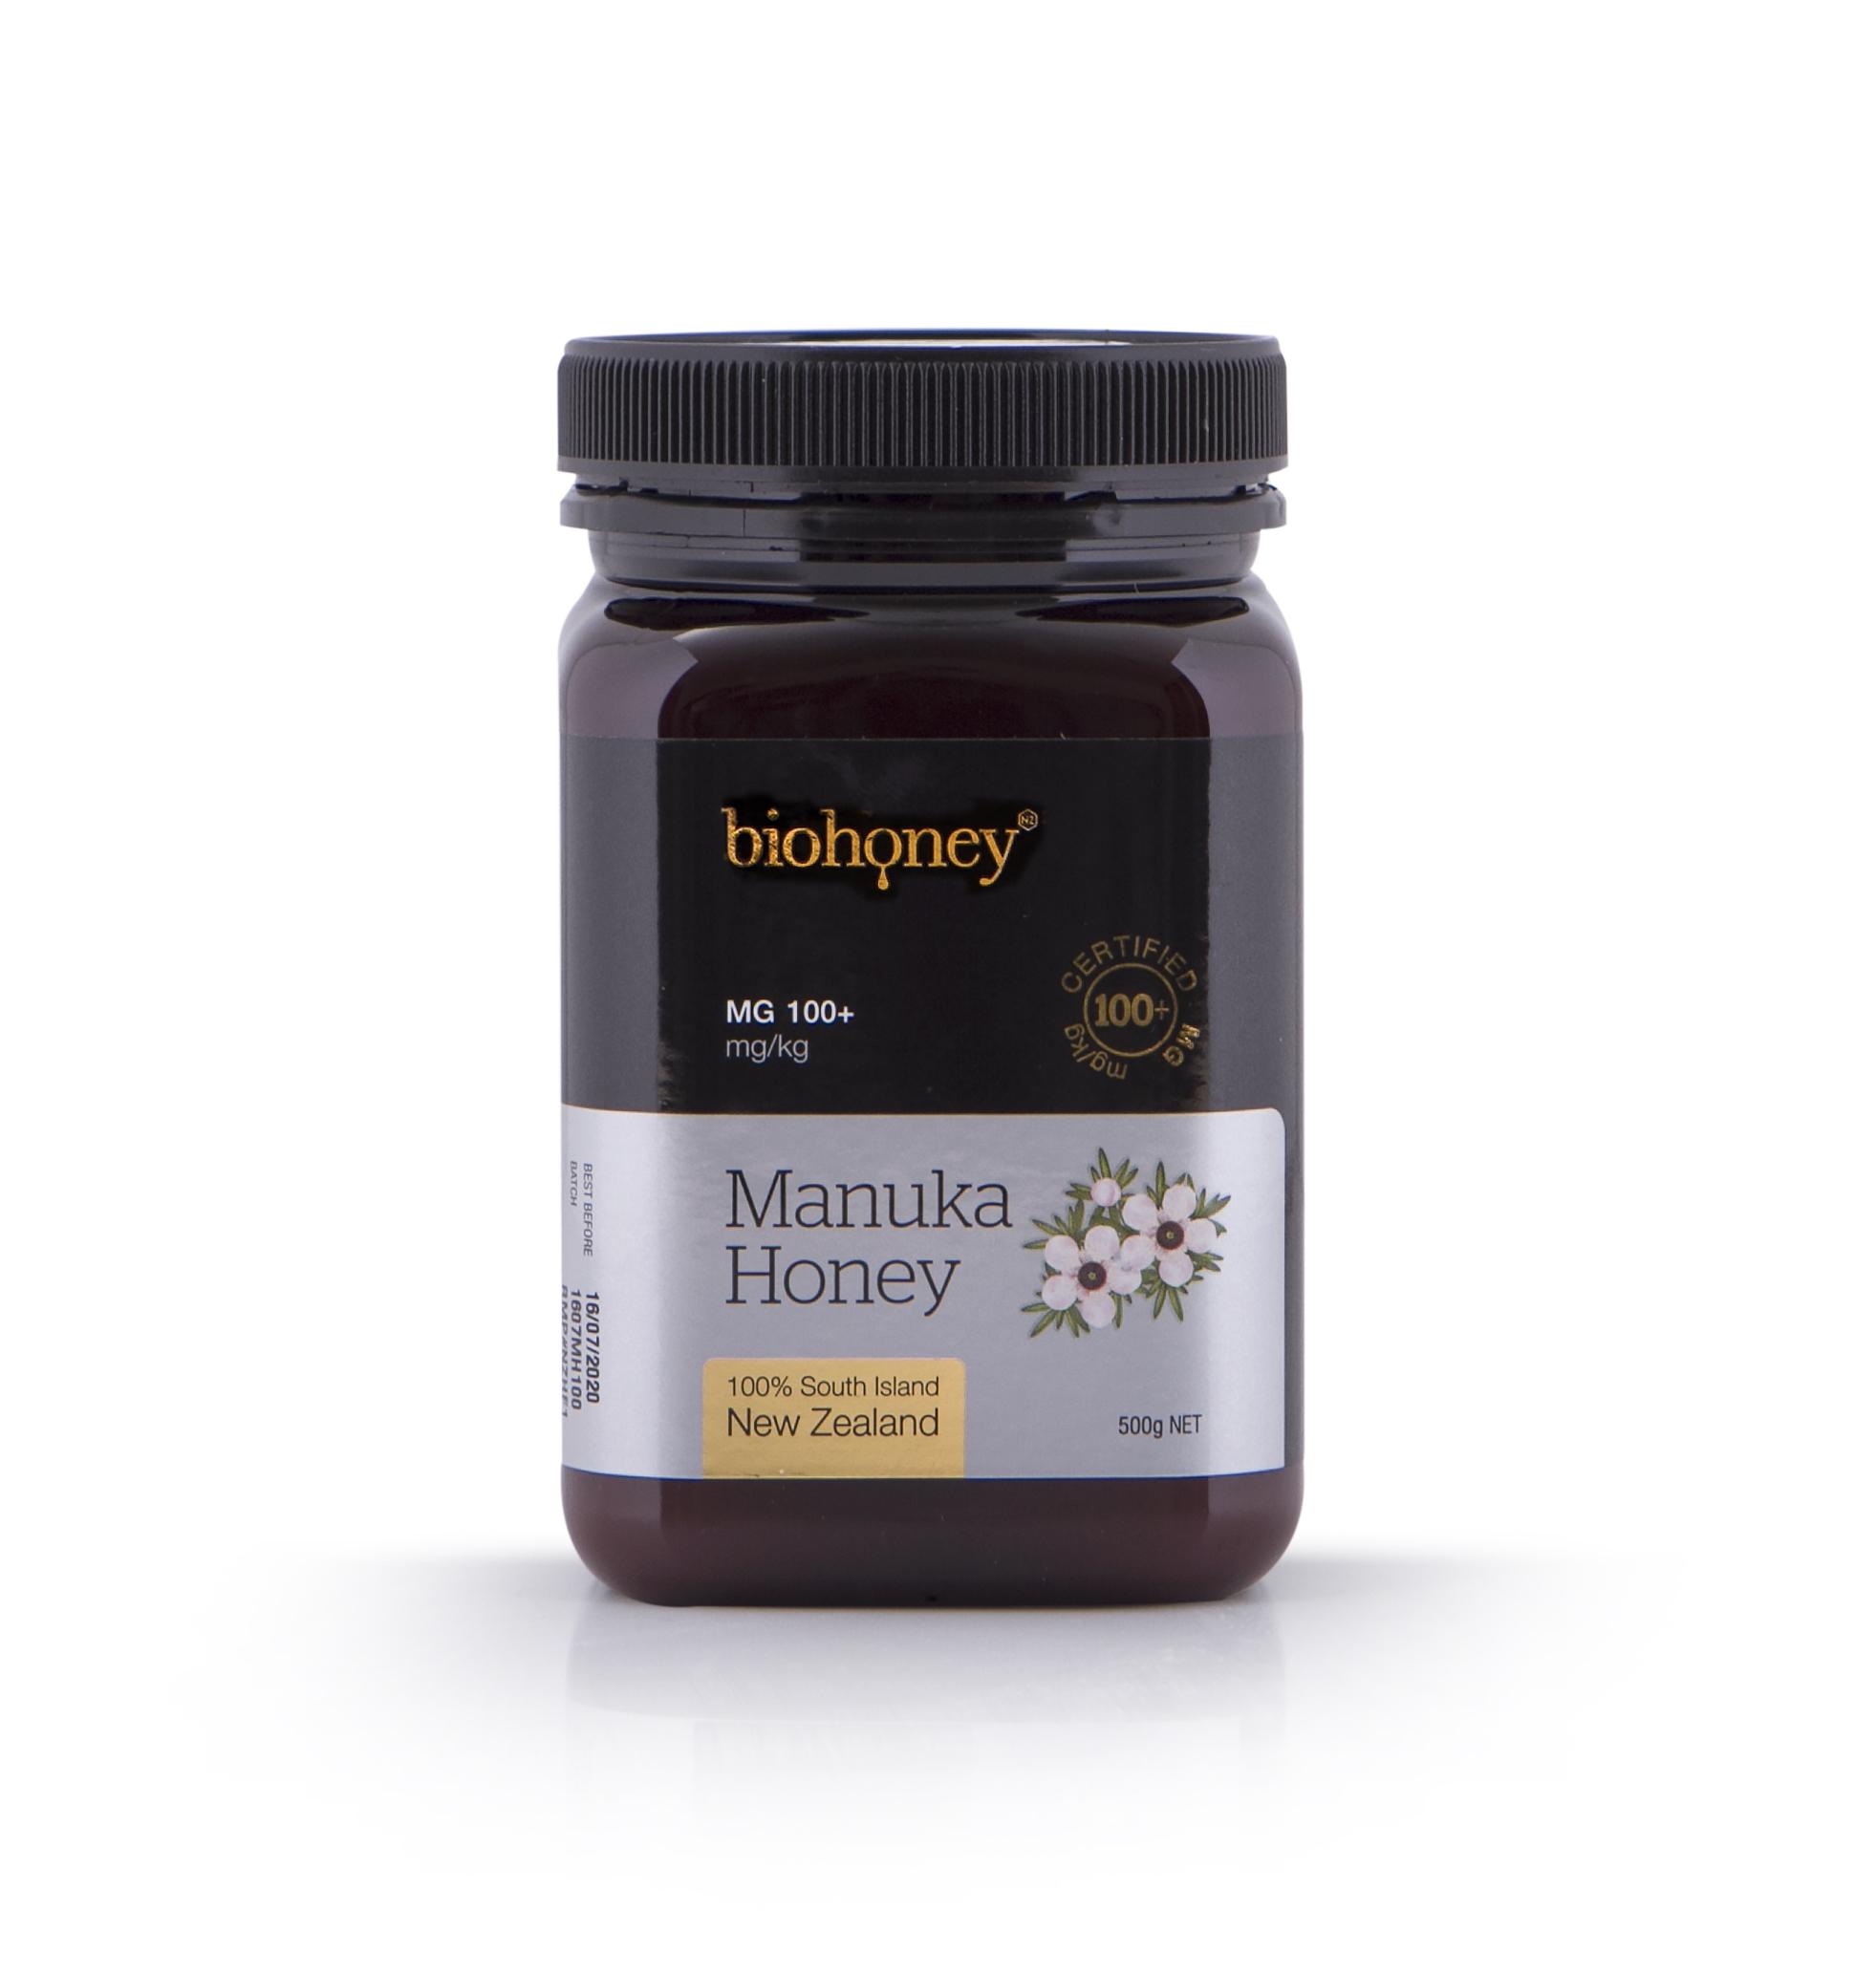 Biohoney Organic Manuka Honey from NZ - Certified MG 100 ...